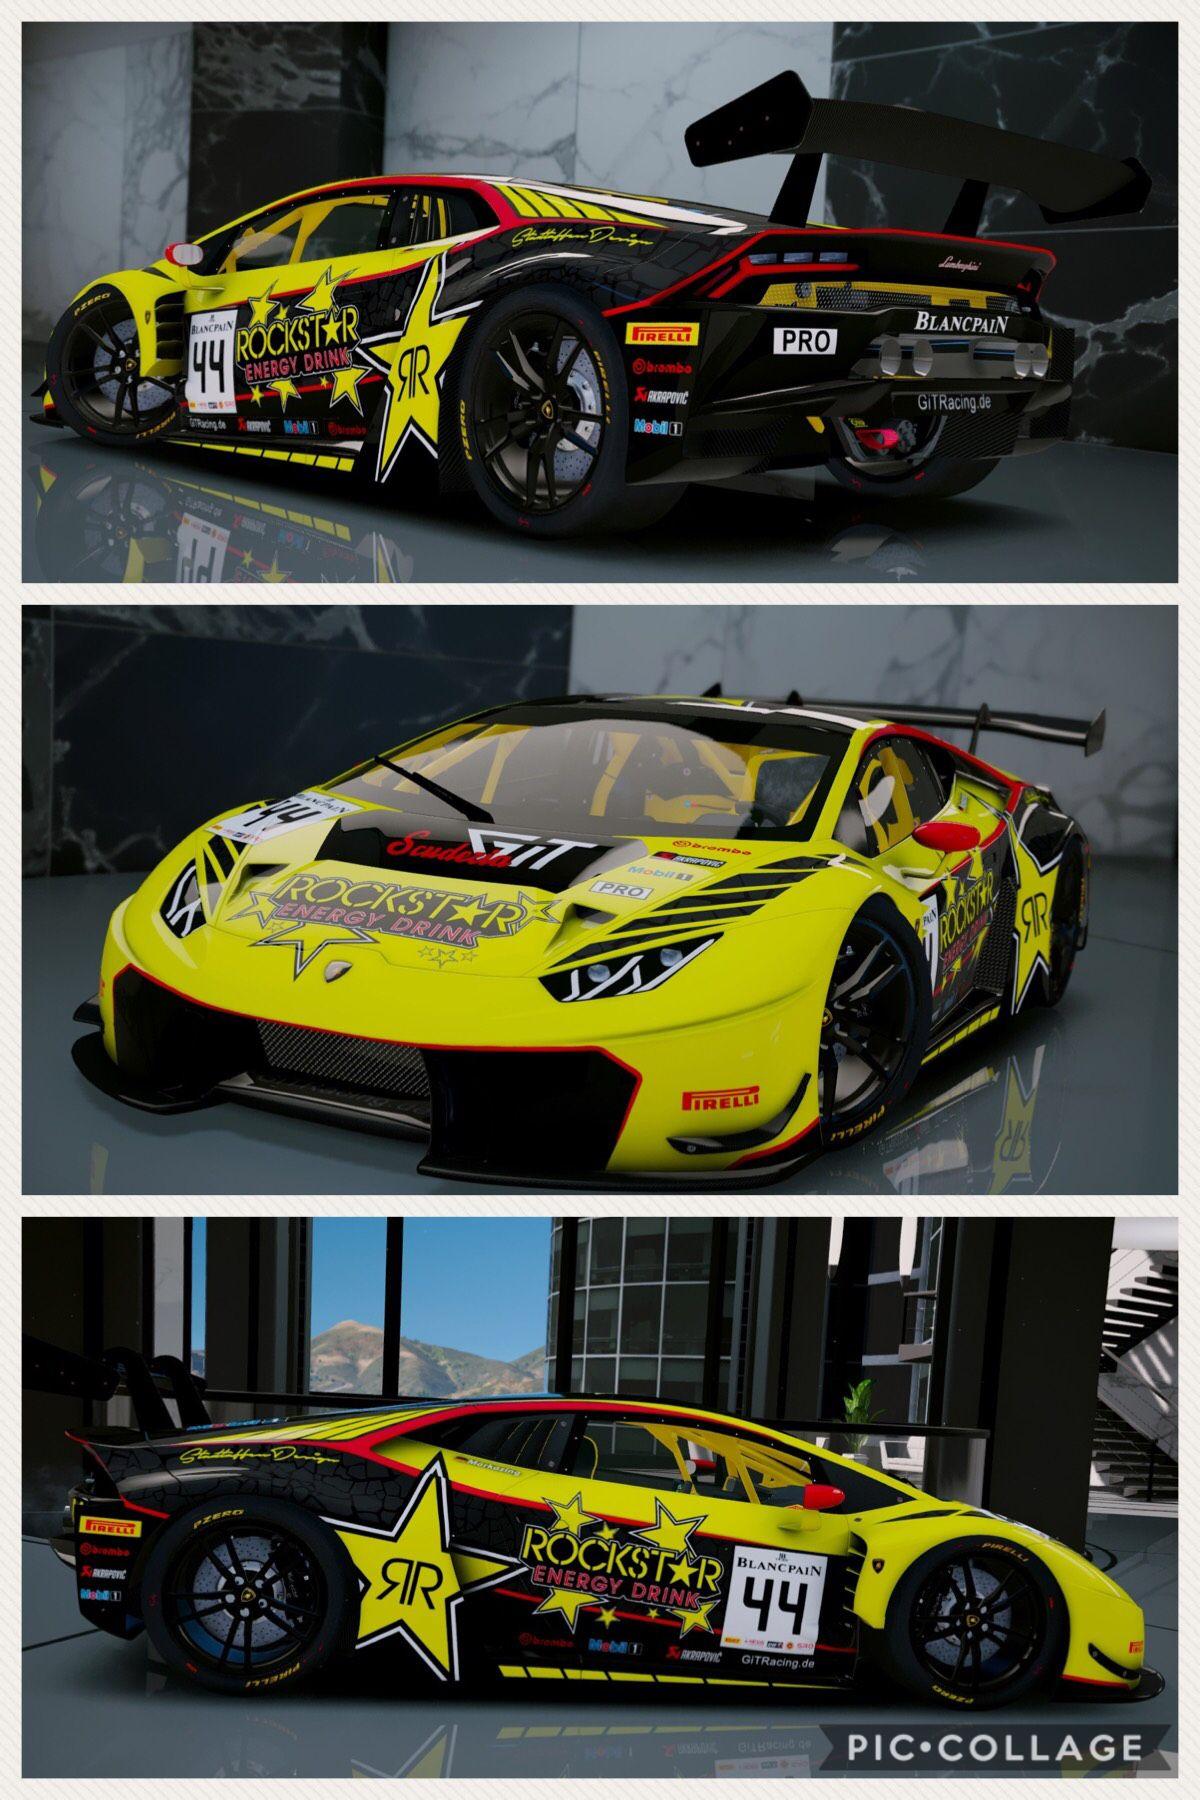 Pin By Jeanre Benjamin On Super Cars Racing Car Design Super Sport Cars Car Painting